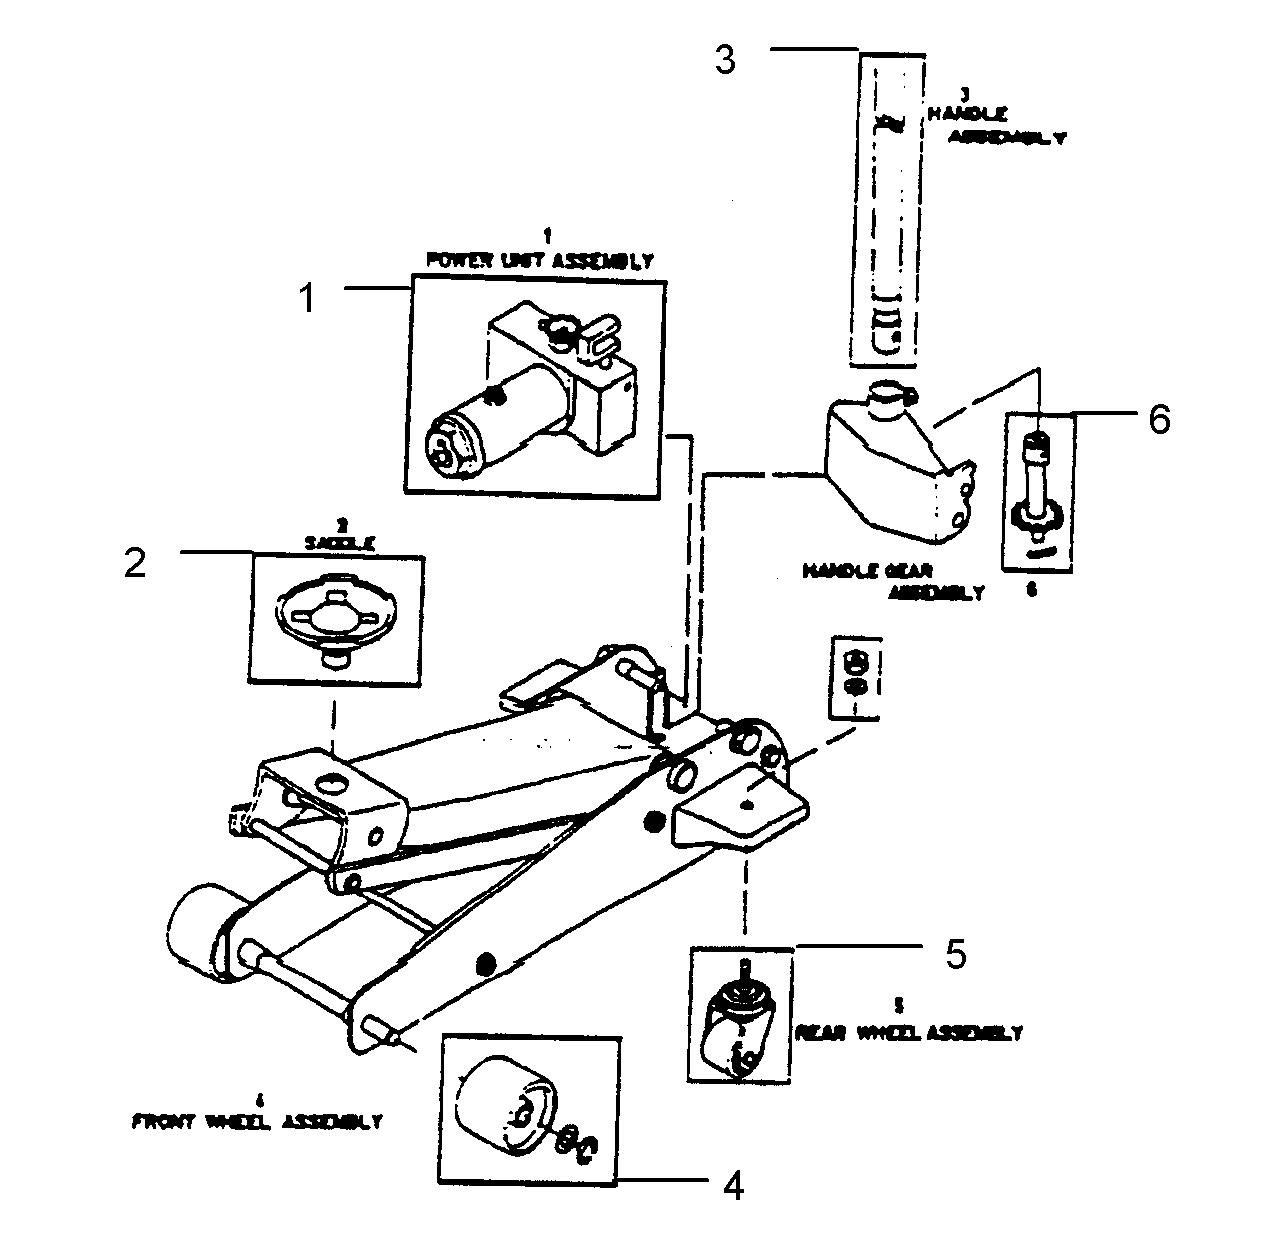 Rj11 Jack Wiring Diagram Manual Guide